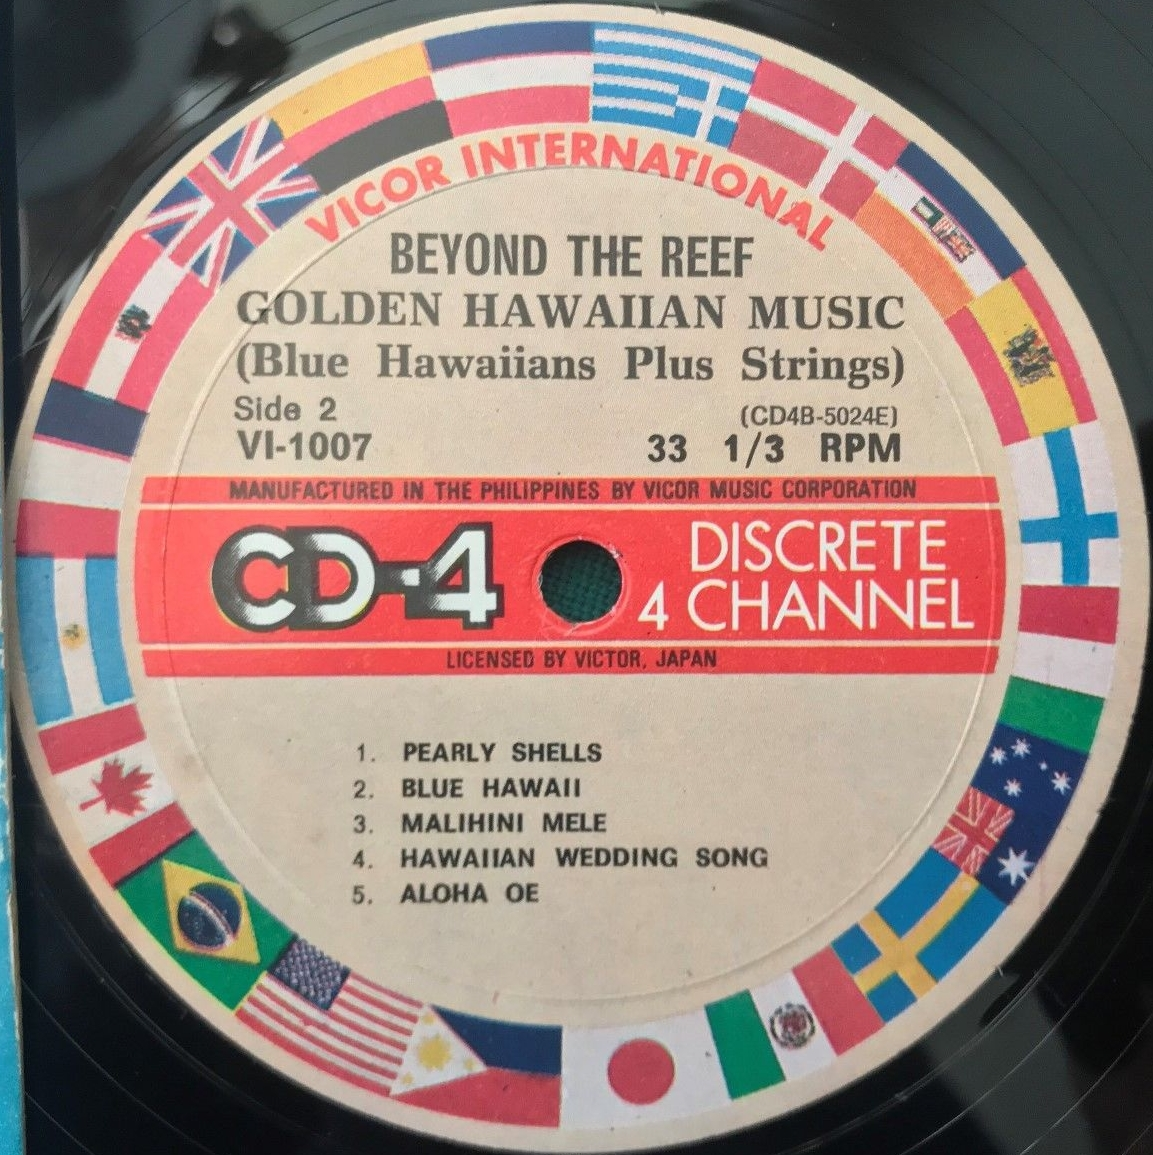 BLUE HAWAIIANS WITH STRINGS -Beyond the Reef. Vicor International VI 1007 (CD4) [Philippines]c.jpg